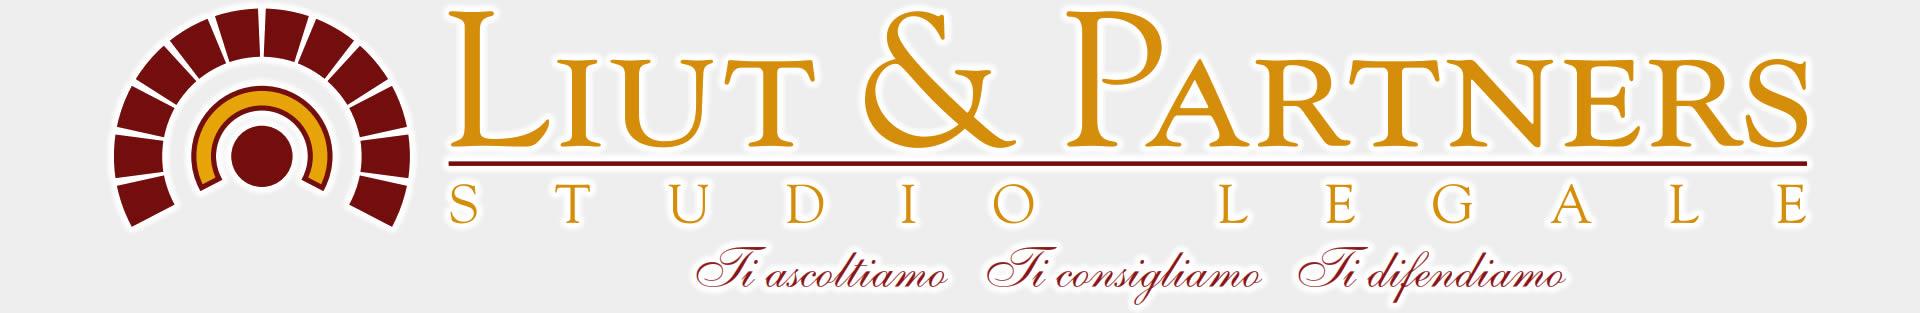 banner studio Legale Liut Giraldo & Partners